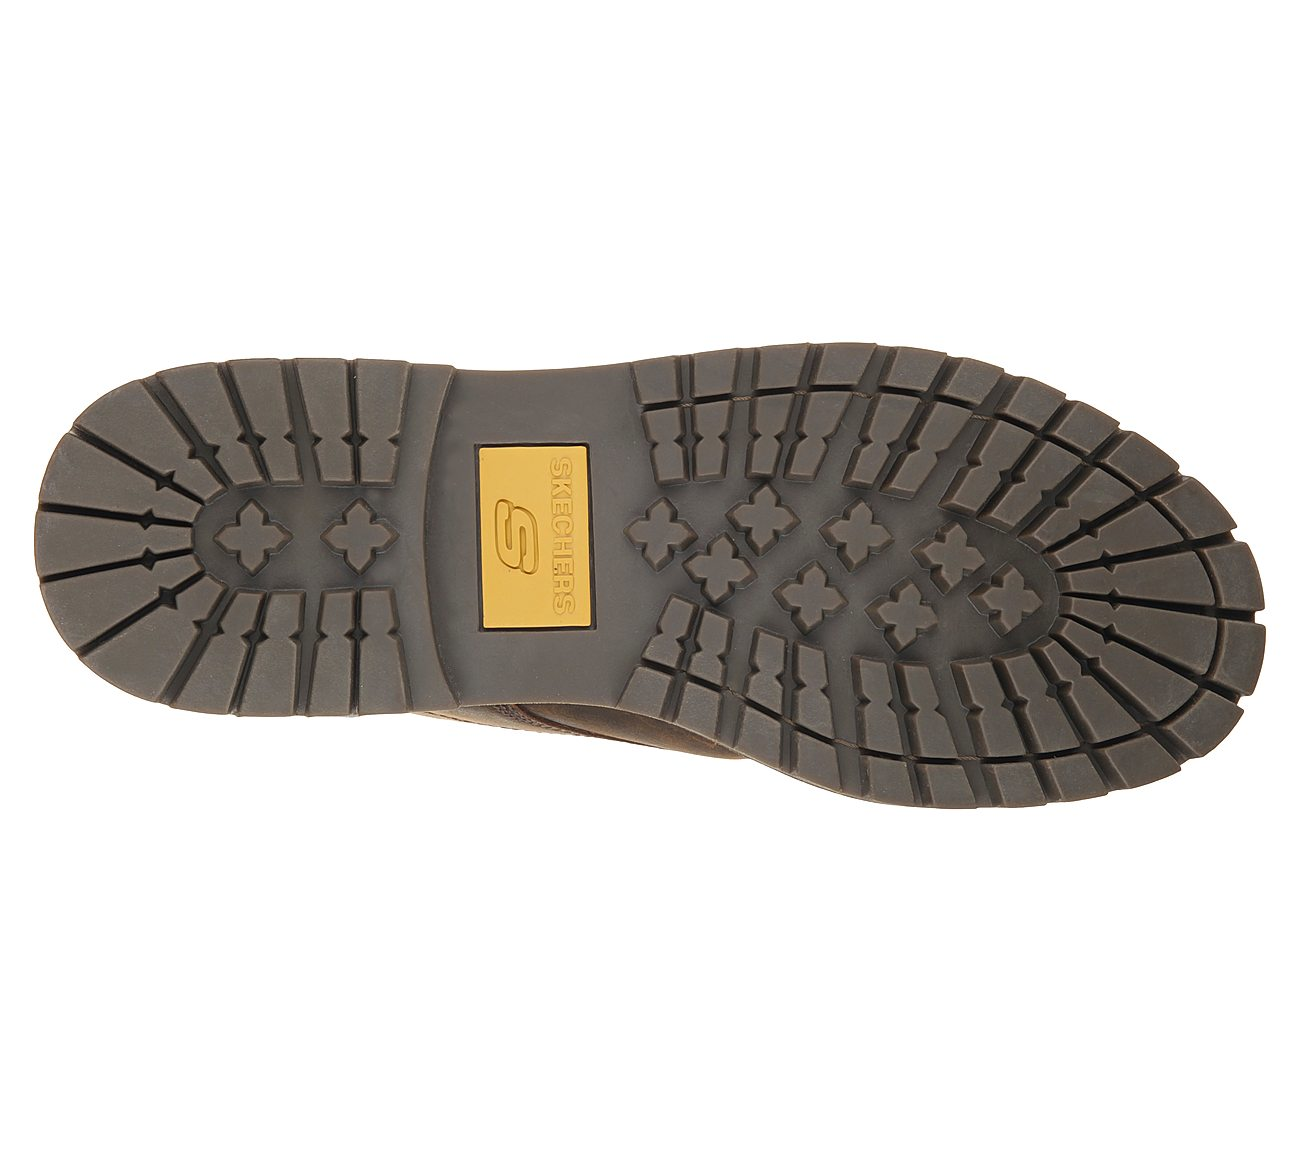 Mens Skechers Bruiser Brown Leather Boots CDB 6643